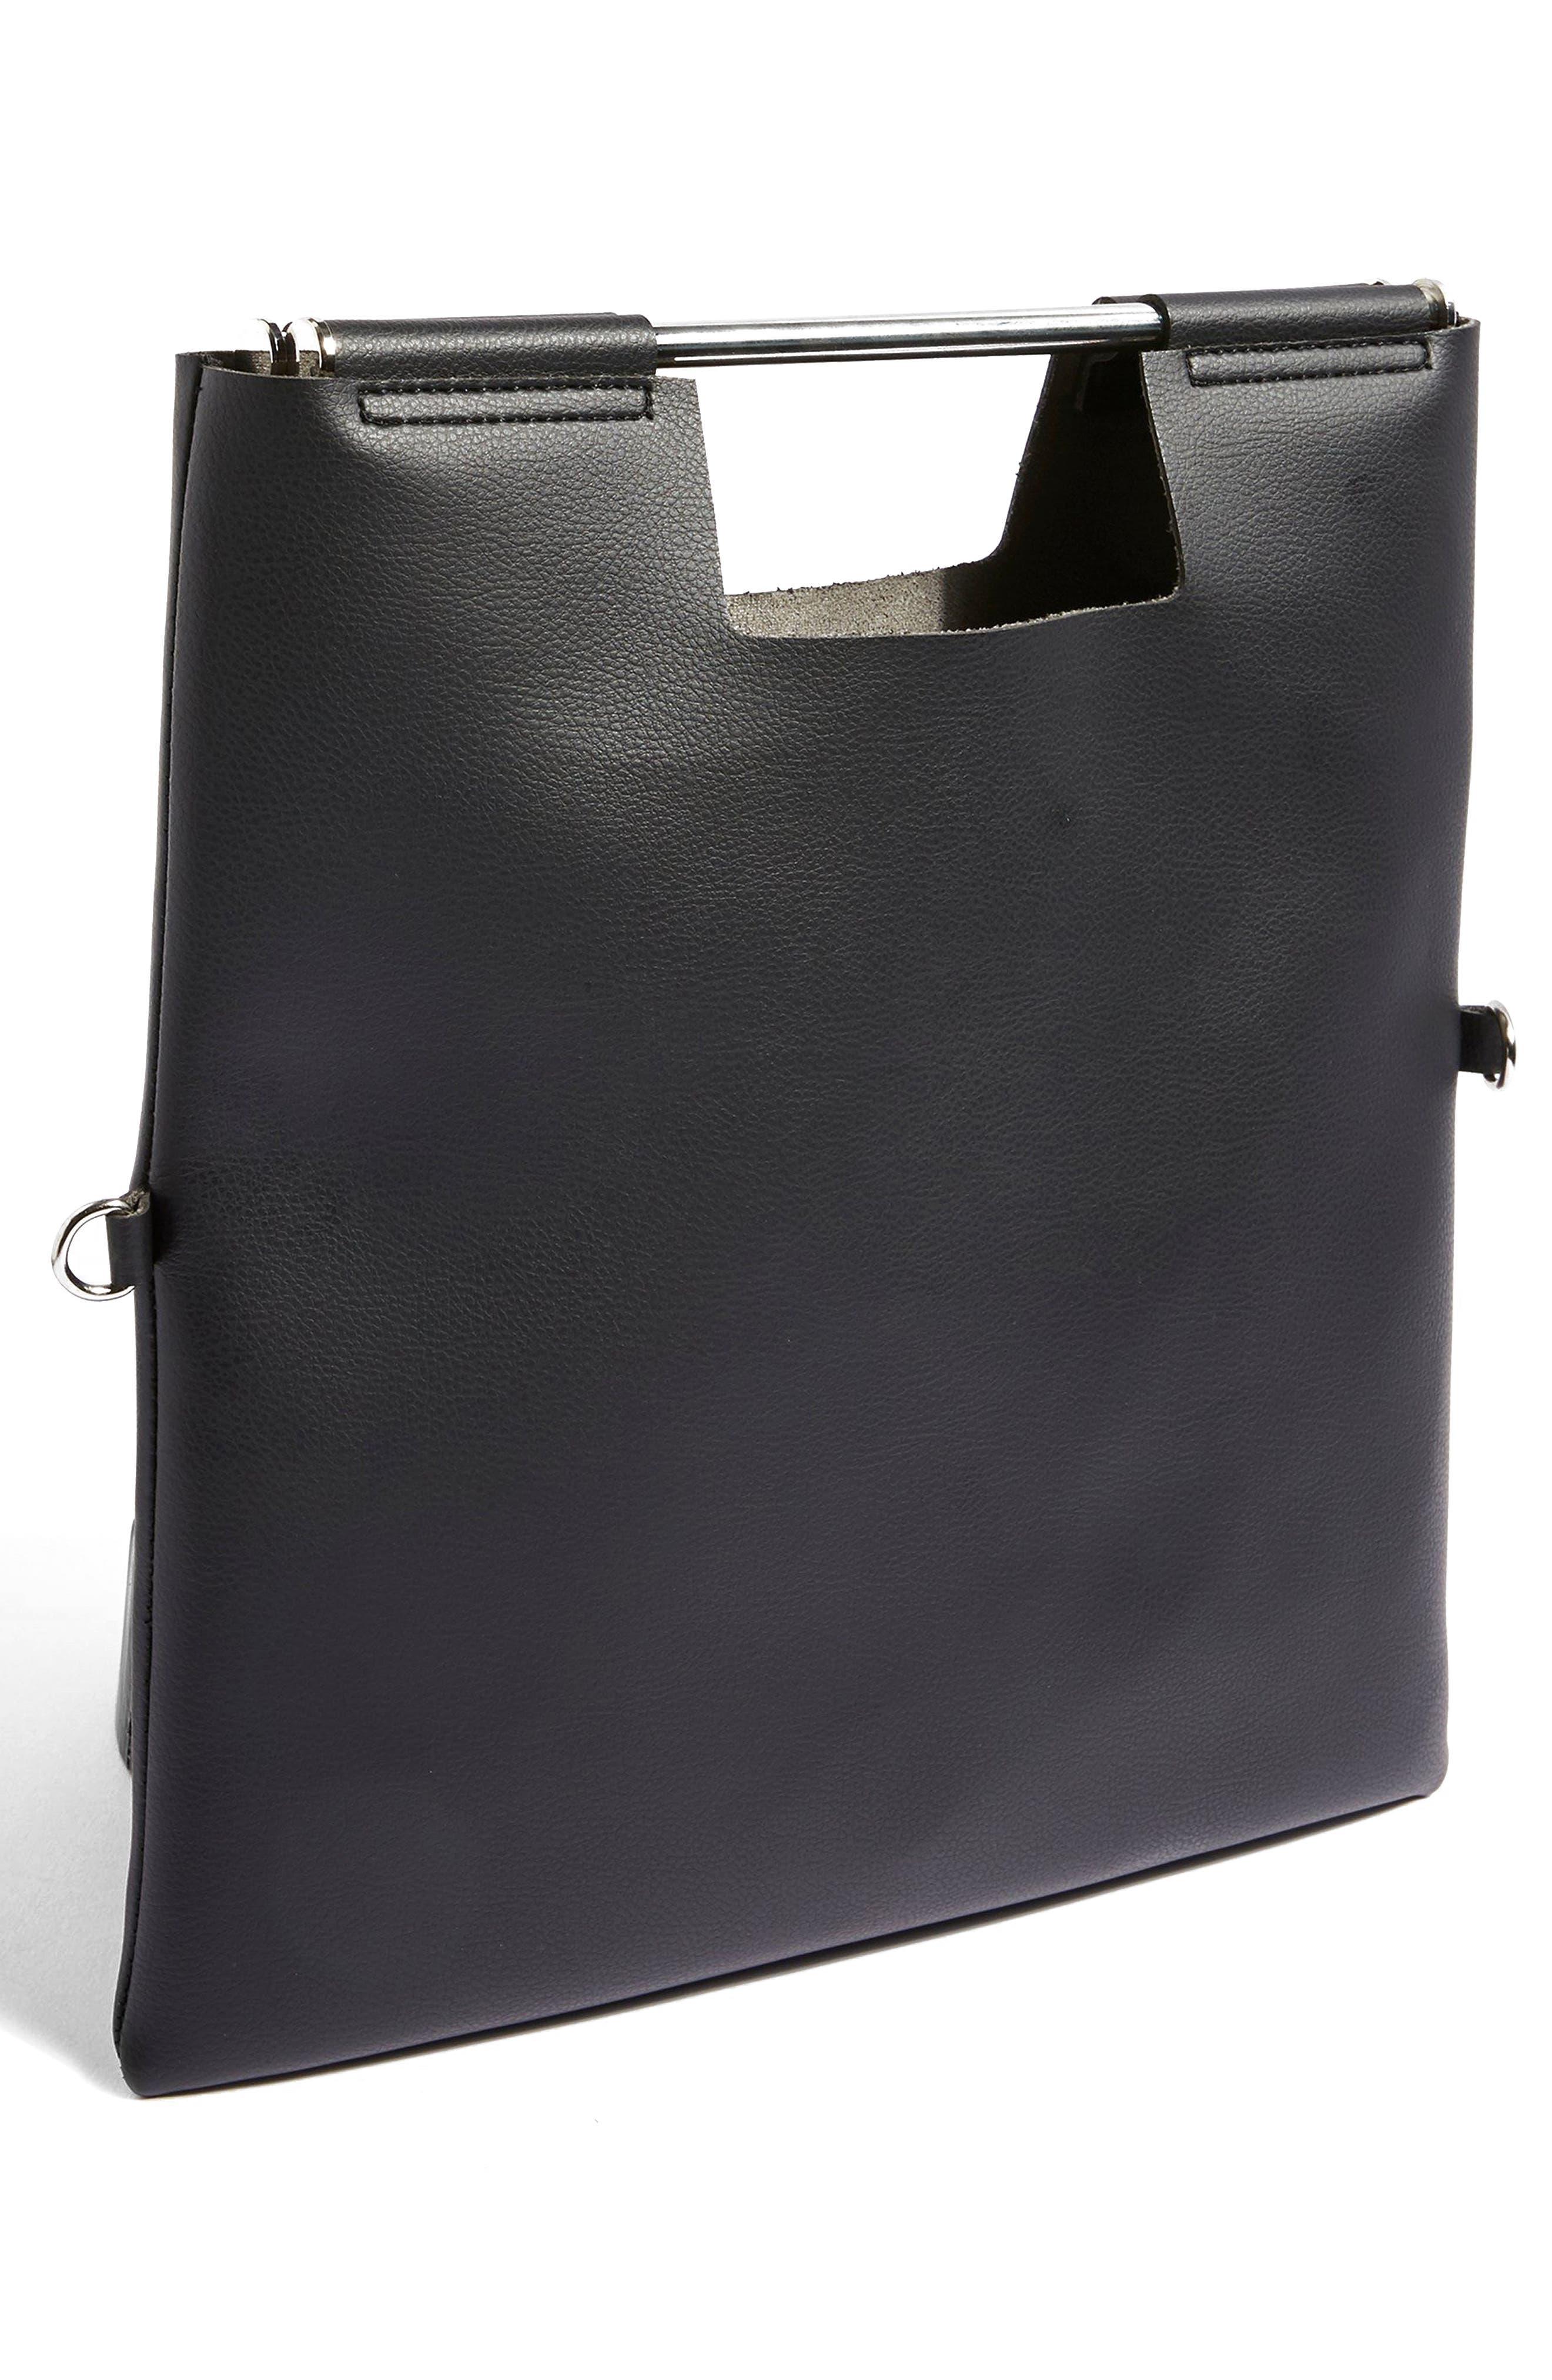 Lotus Metal Handle Clutch Bag,                             Alternate thumbnail 4, color,                             001